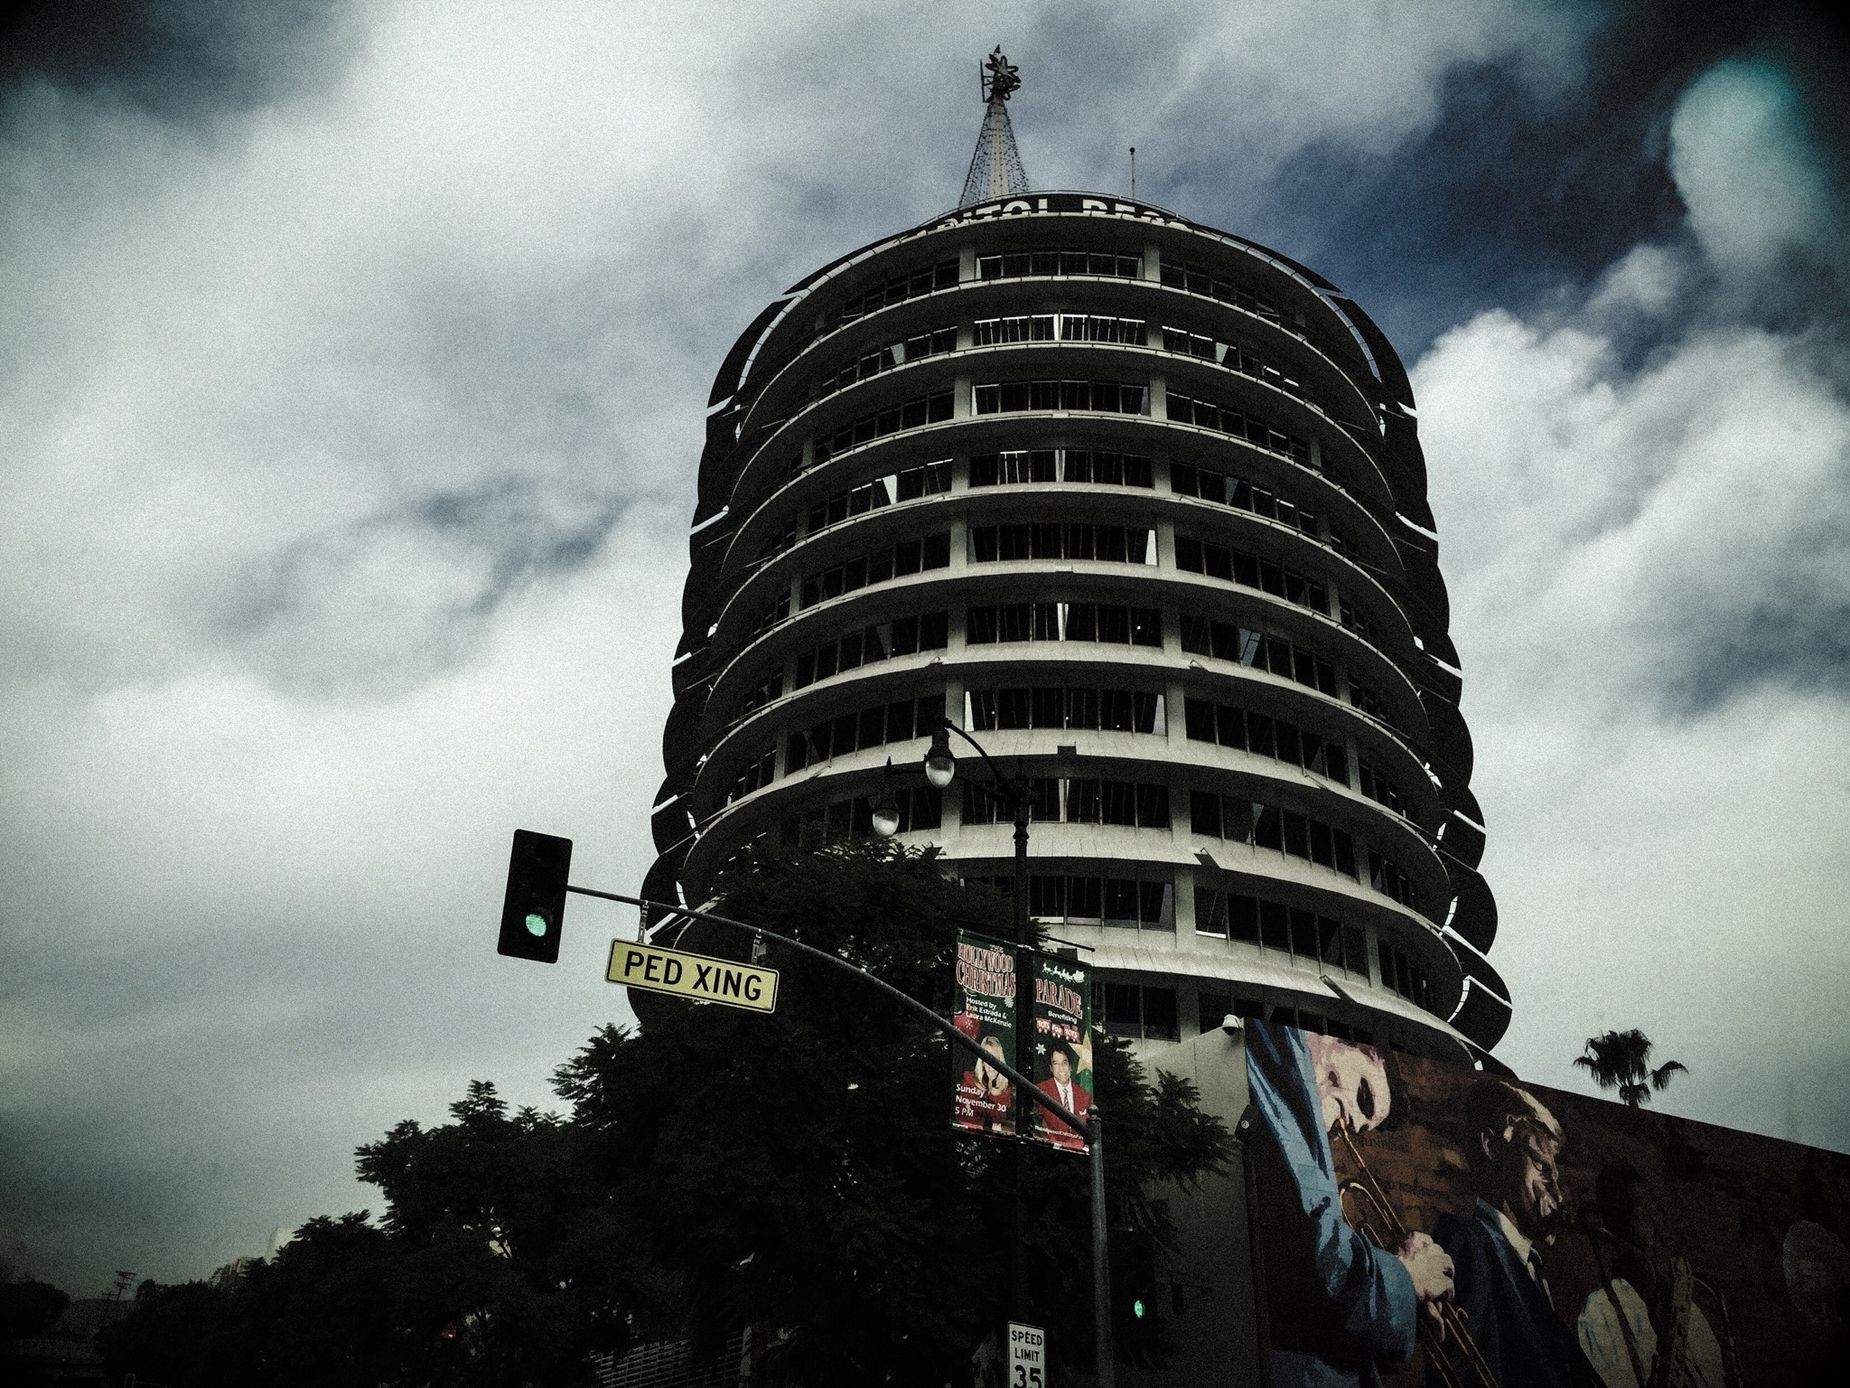 Capitol Records Bldg. Iphone6plus Los Angeles, California City Cityscape Buildings Capitol Records